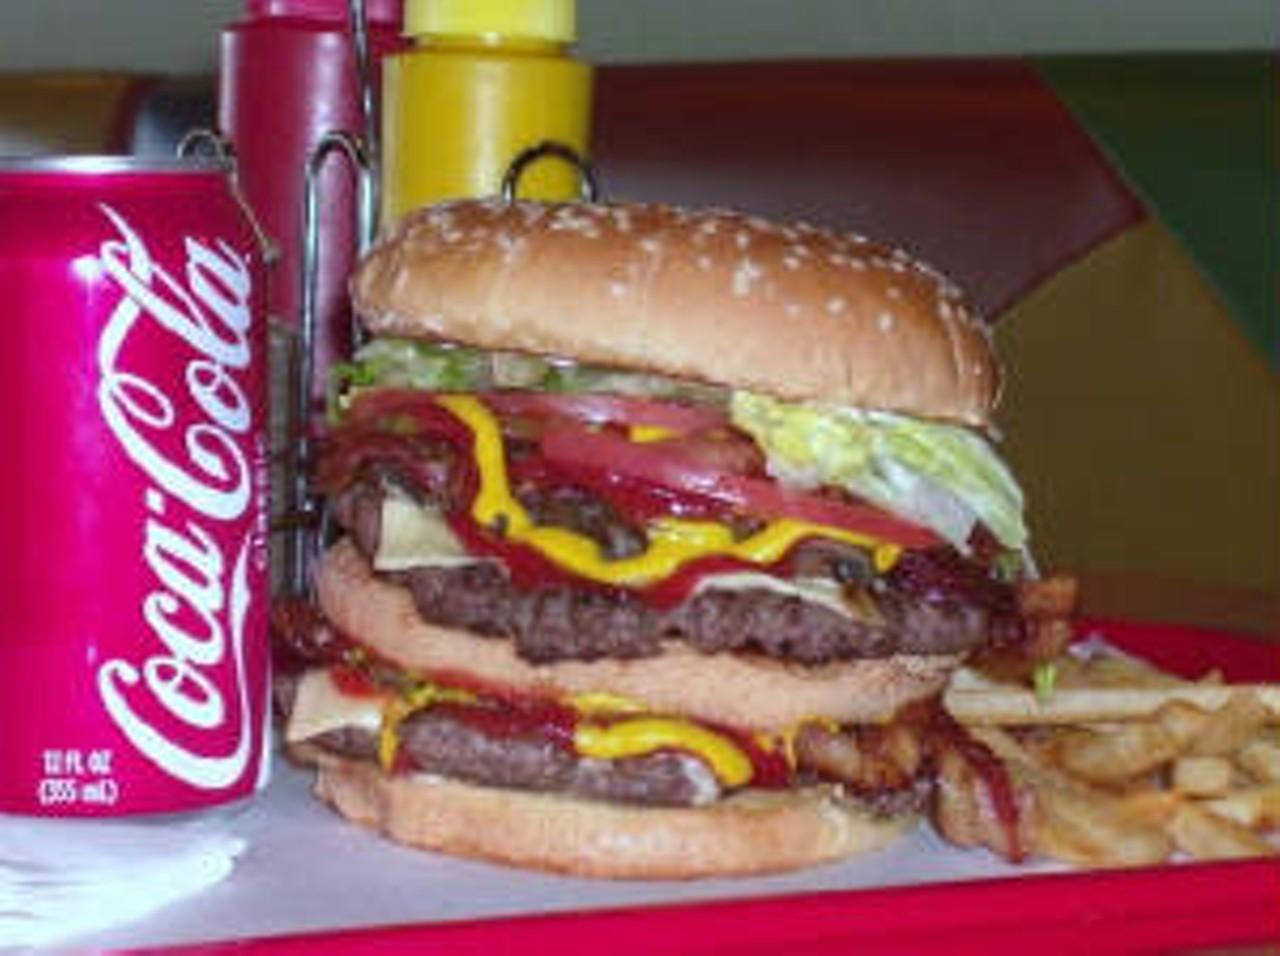 jaws jumbo burger greater detroit area american burgers restaurant. Black Bedroom Furniture Sets. Home Design Ideas